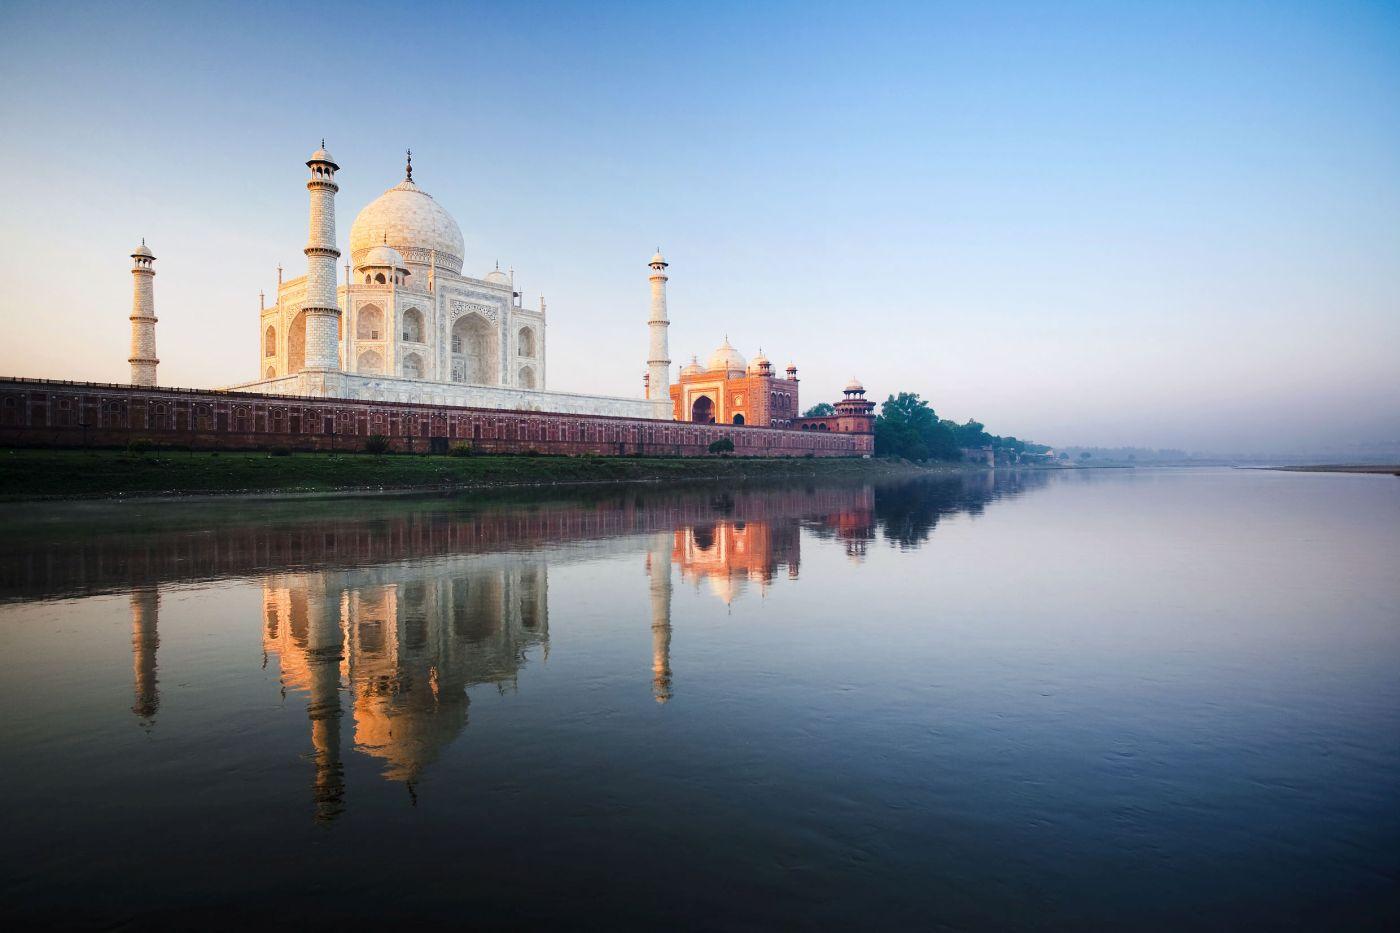 Taj Mahal (c) Panthermedia pius99